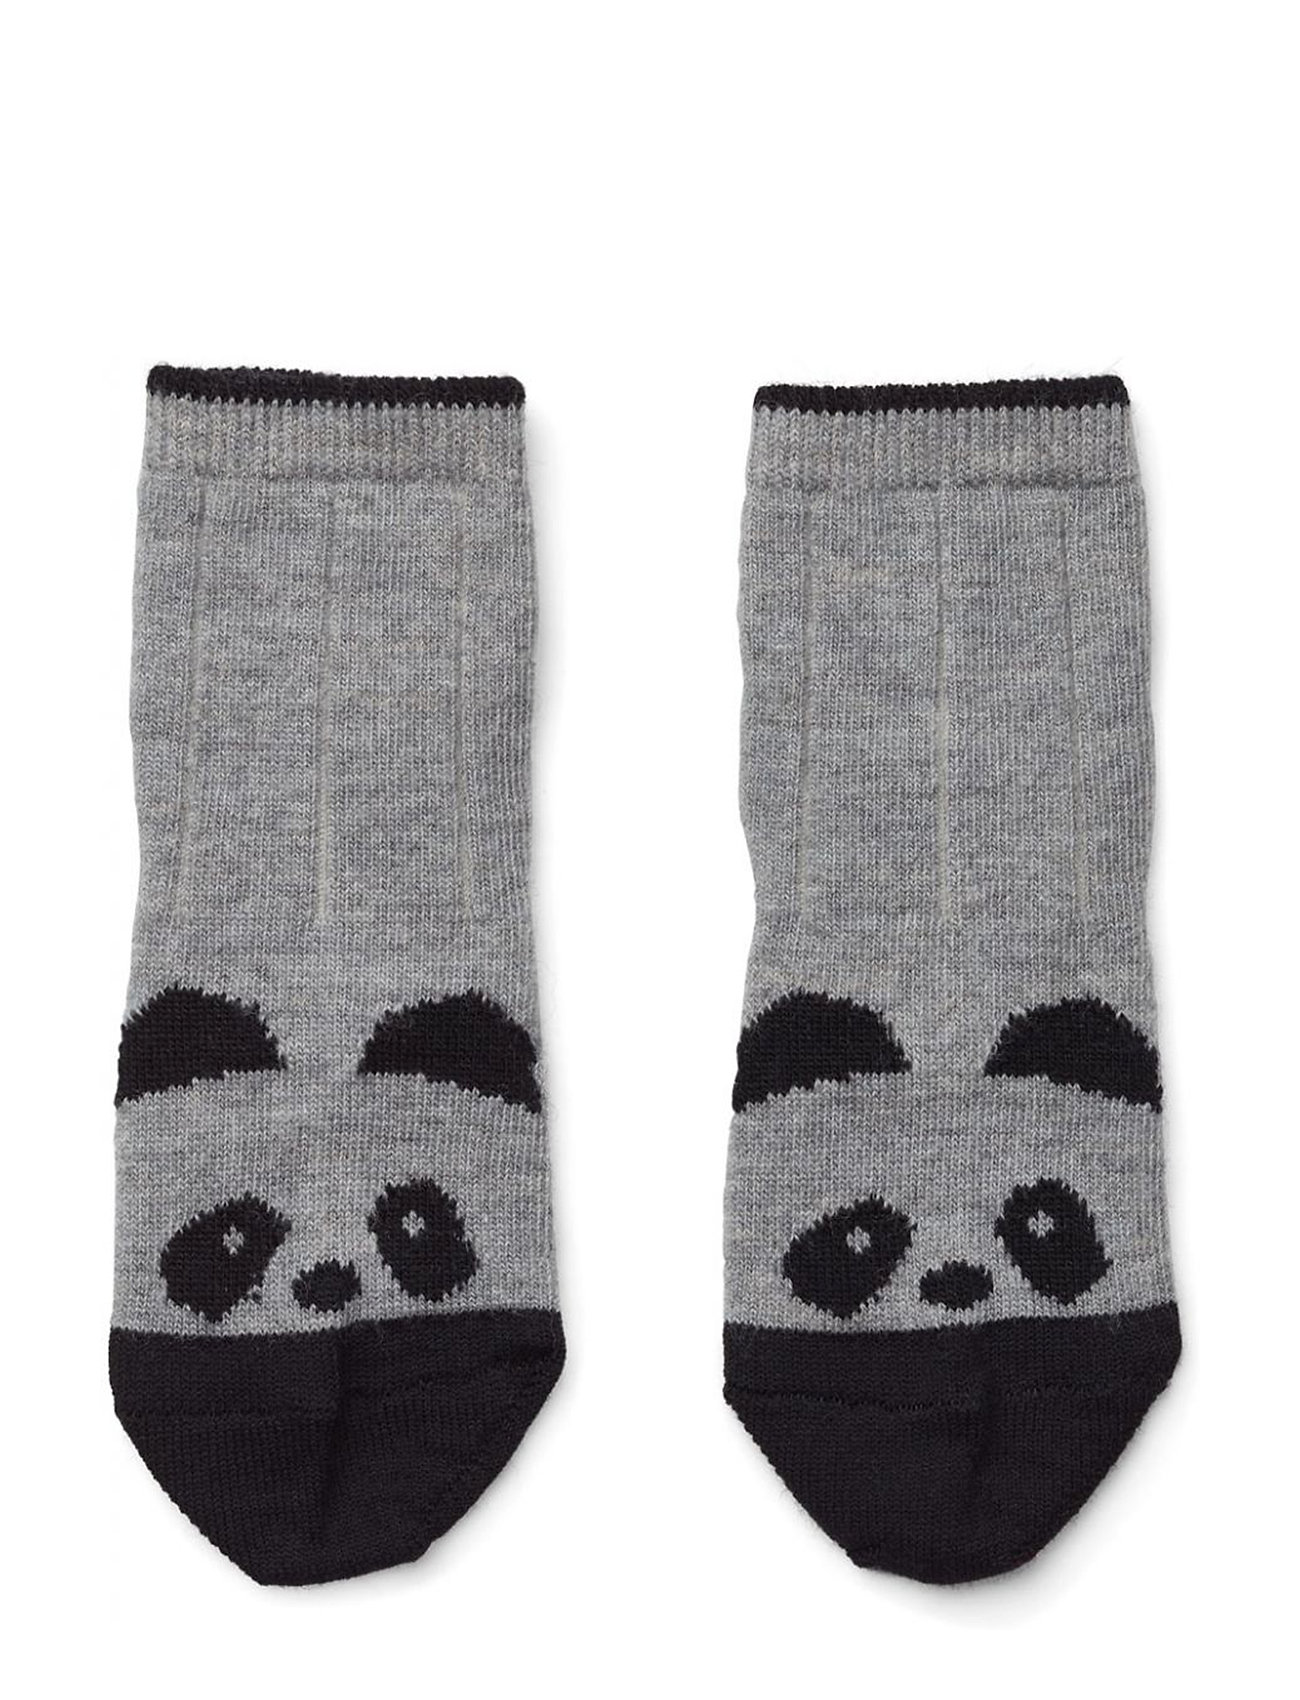 Liewood Silas wool socks